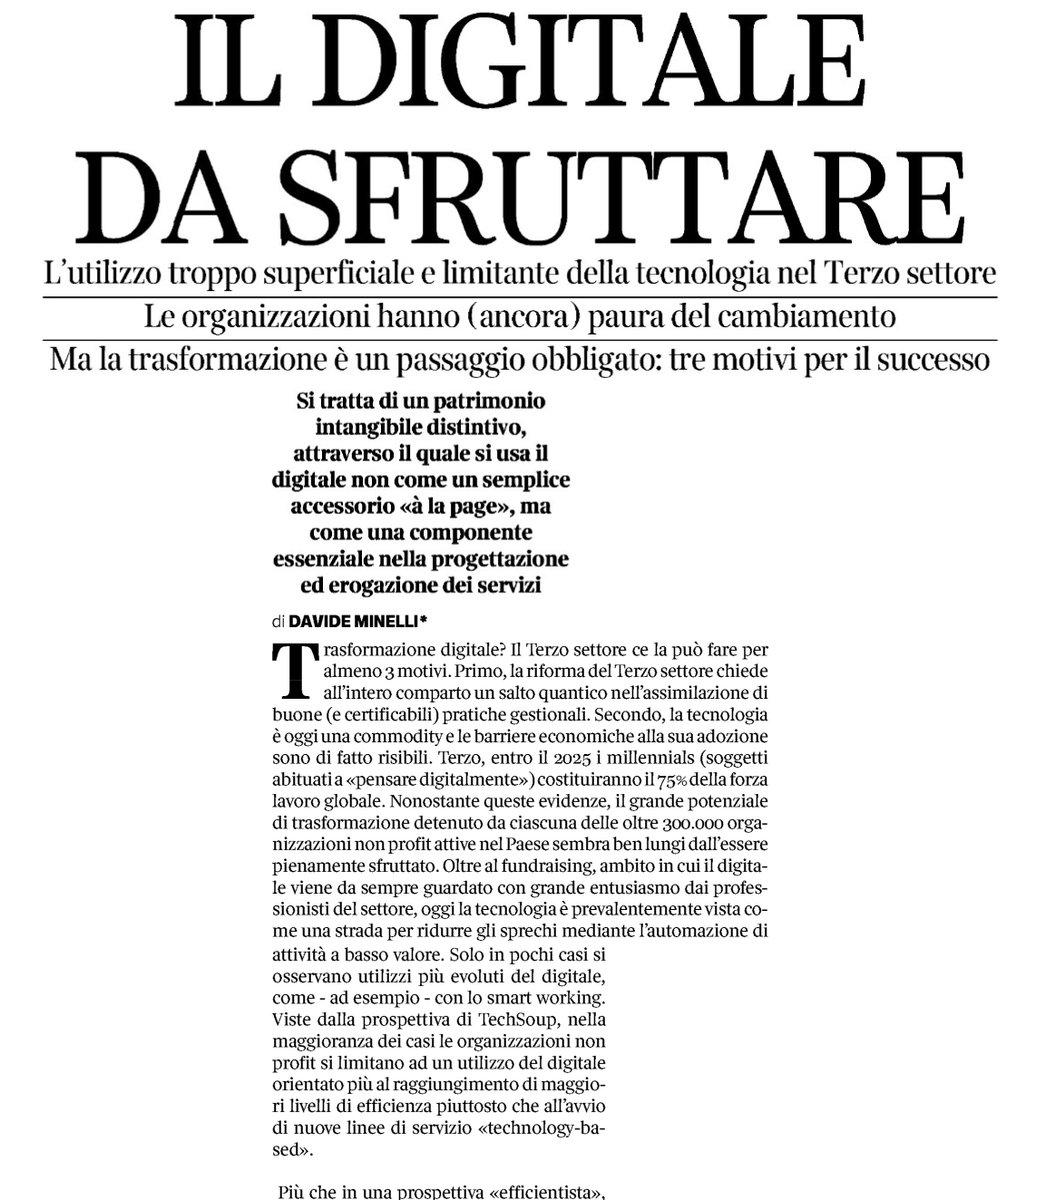 Via @CorriereBN \